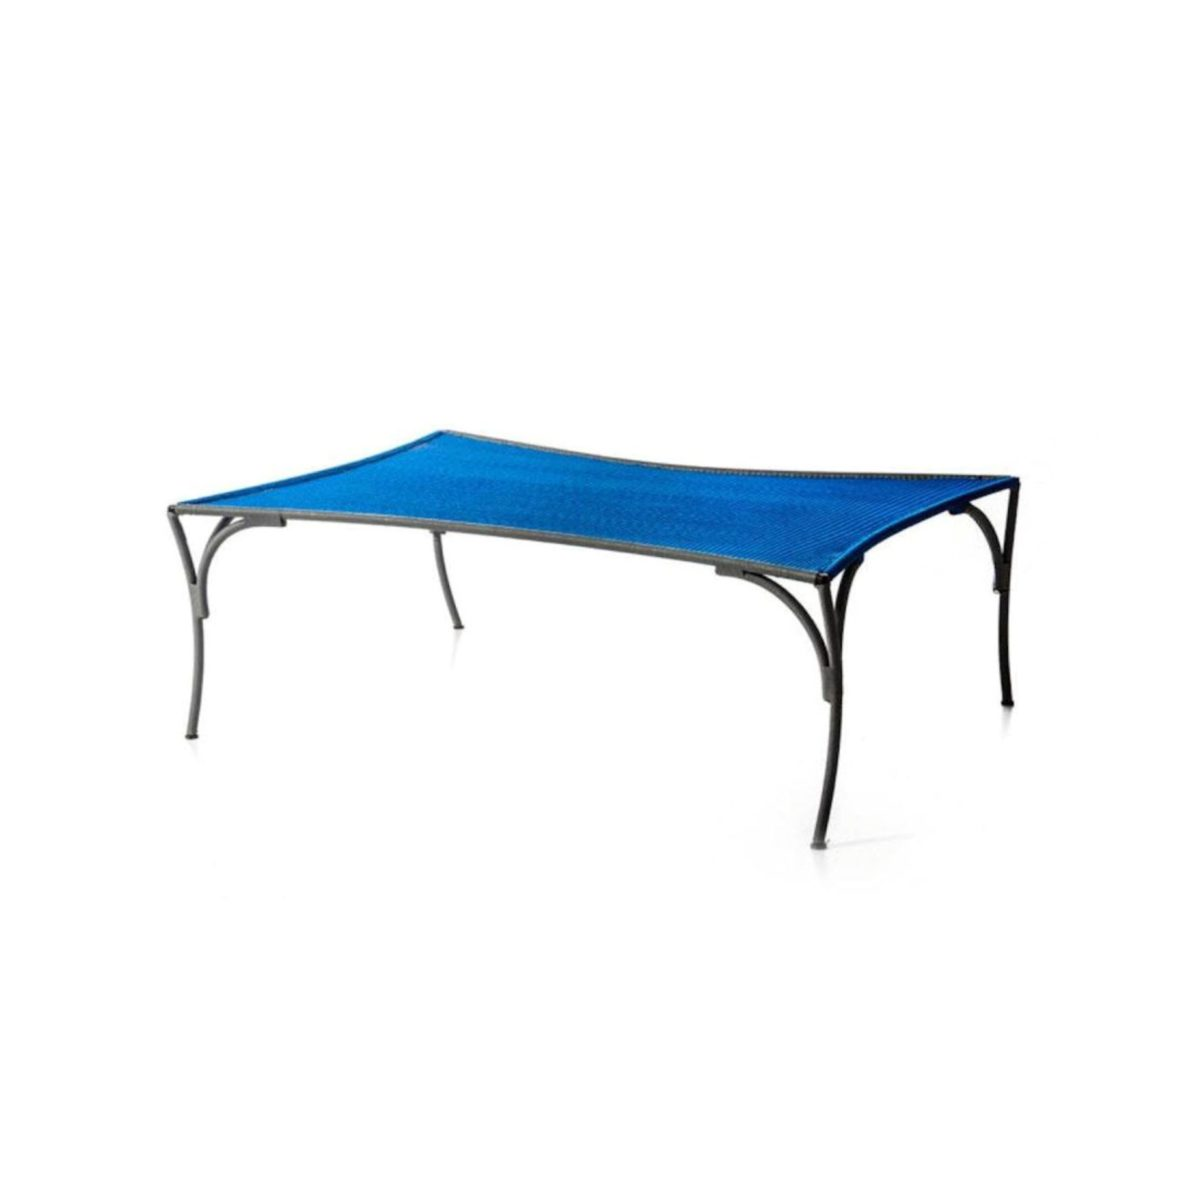 купить стол Arco tavolino moroso